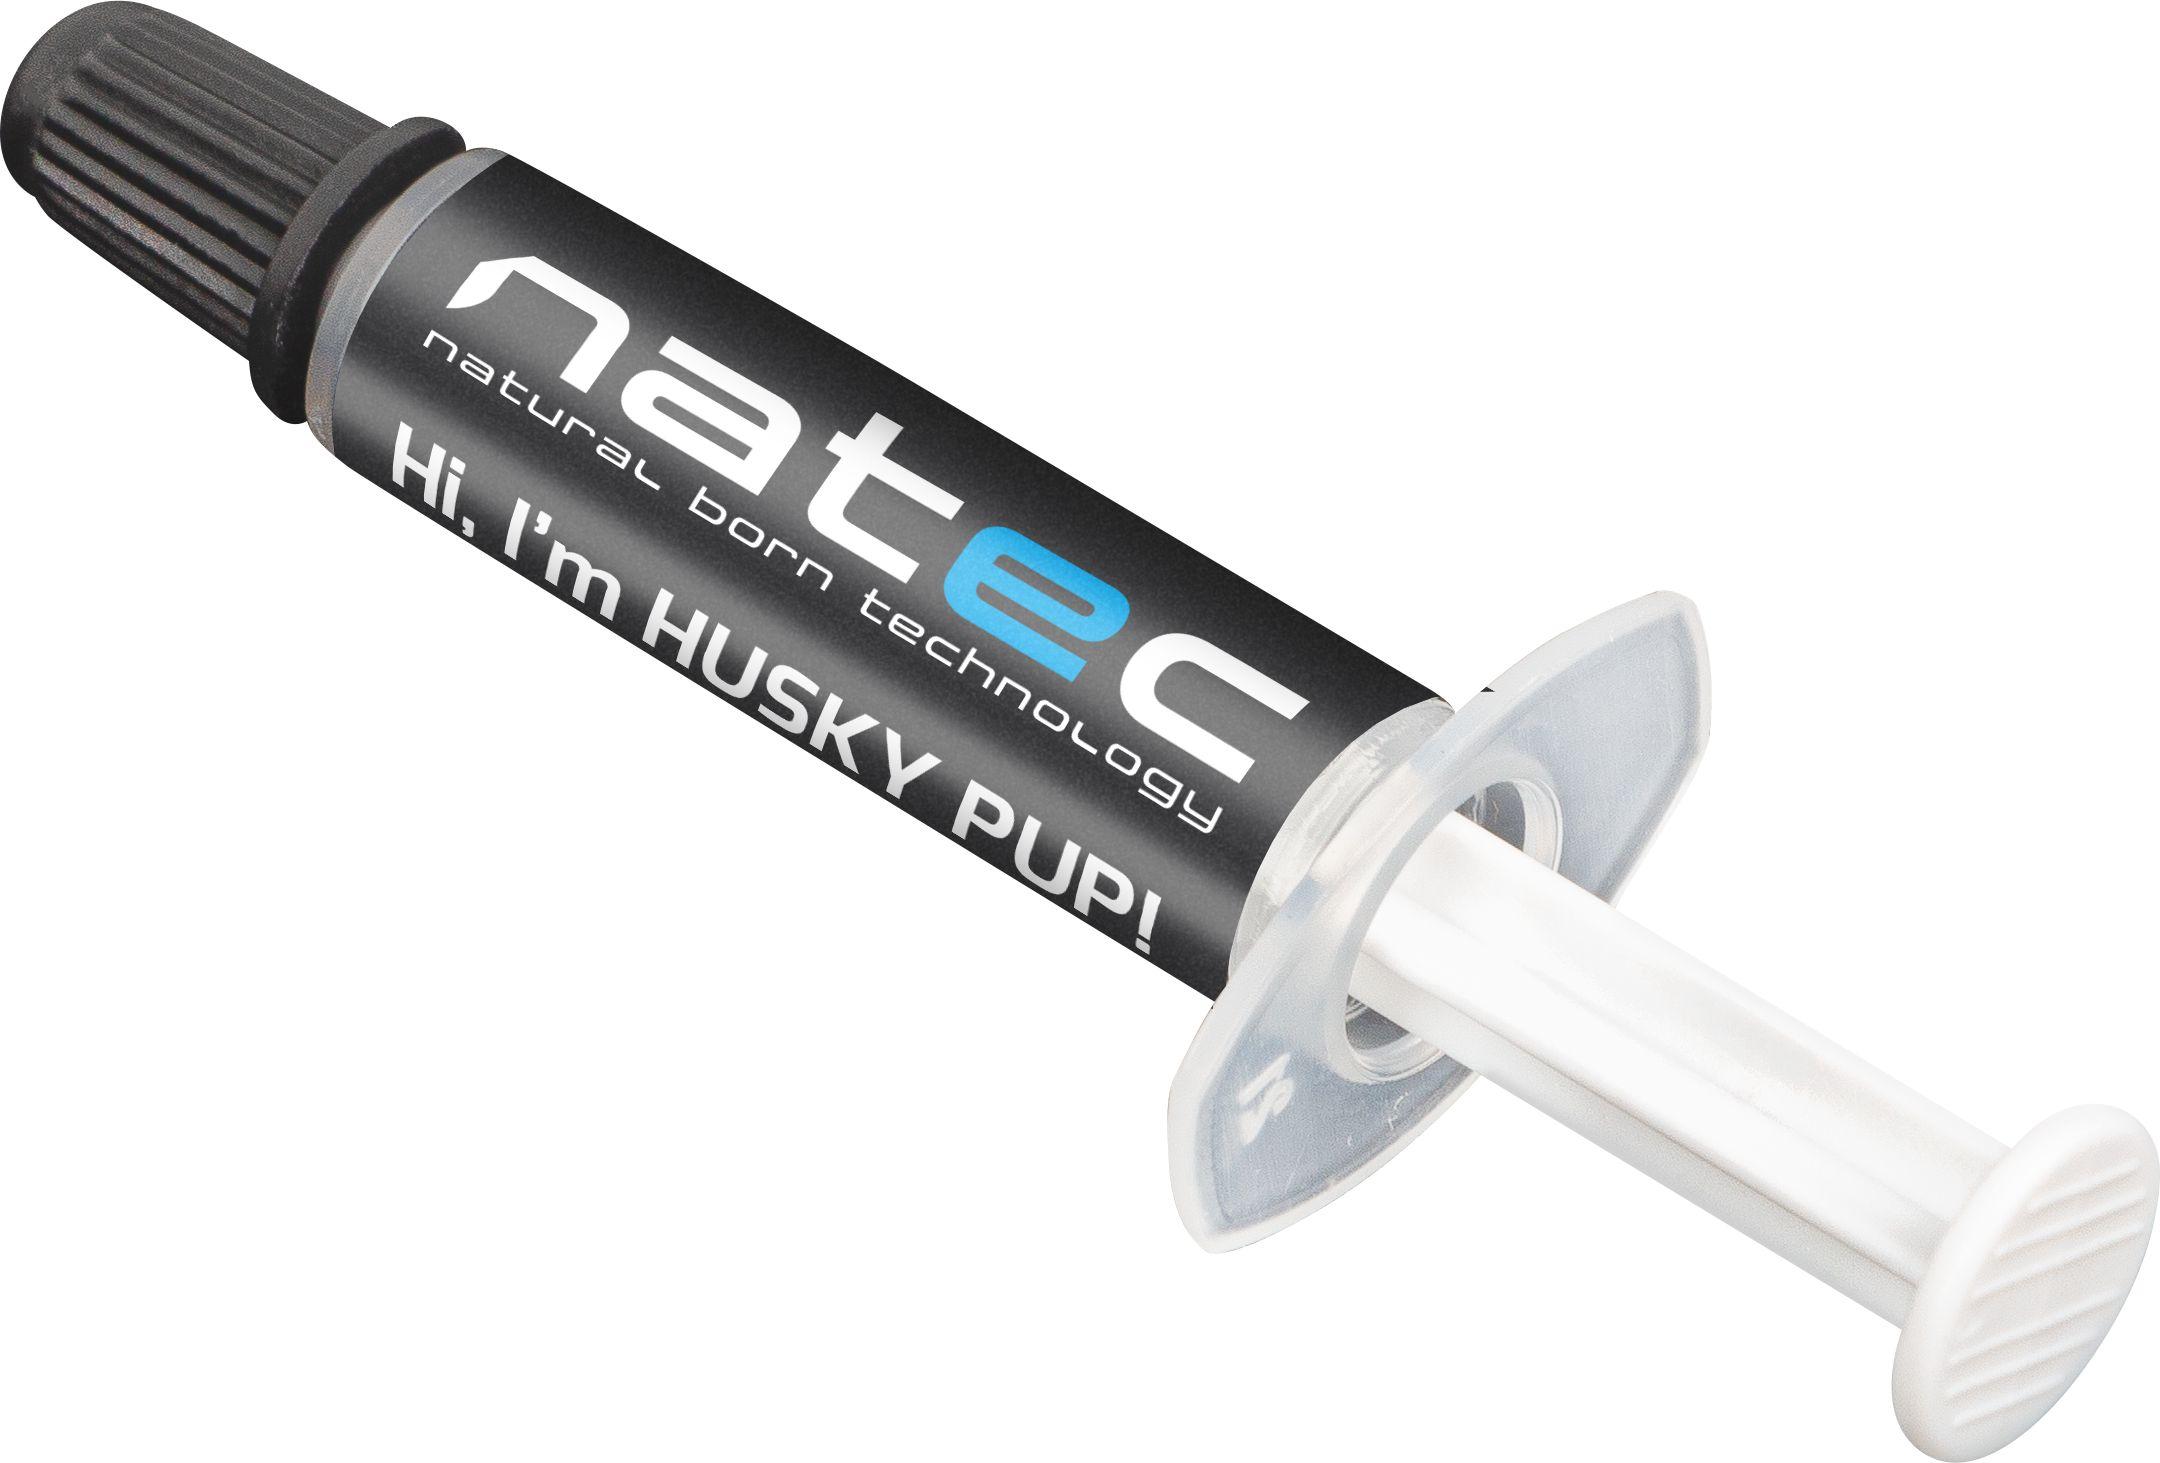 Natec Husky PUP thermal paste 0.5g (NPT-1580) termopasta